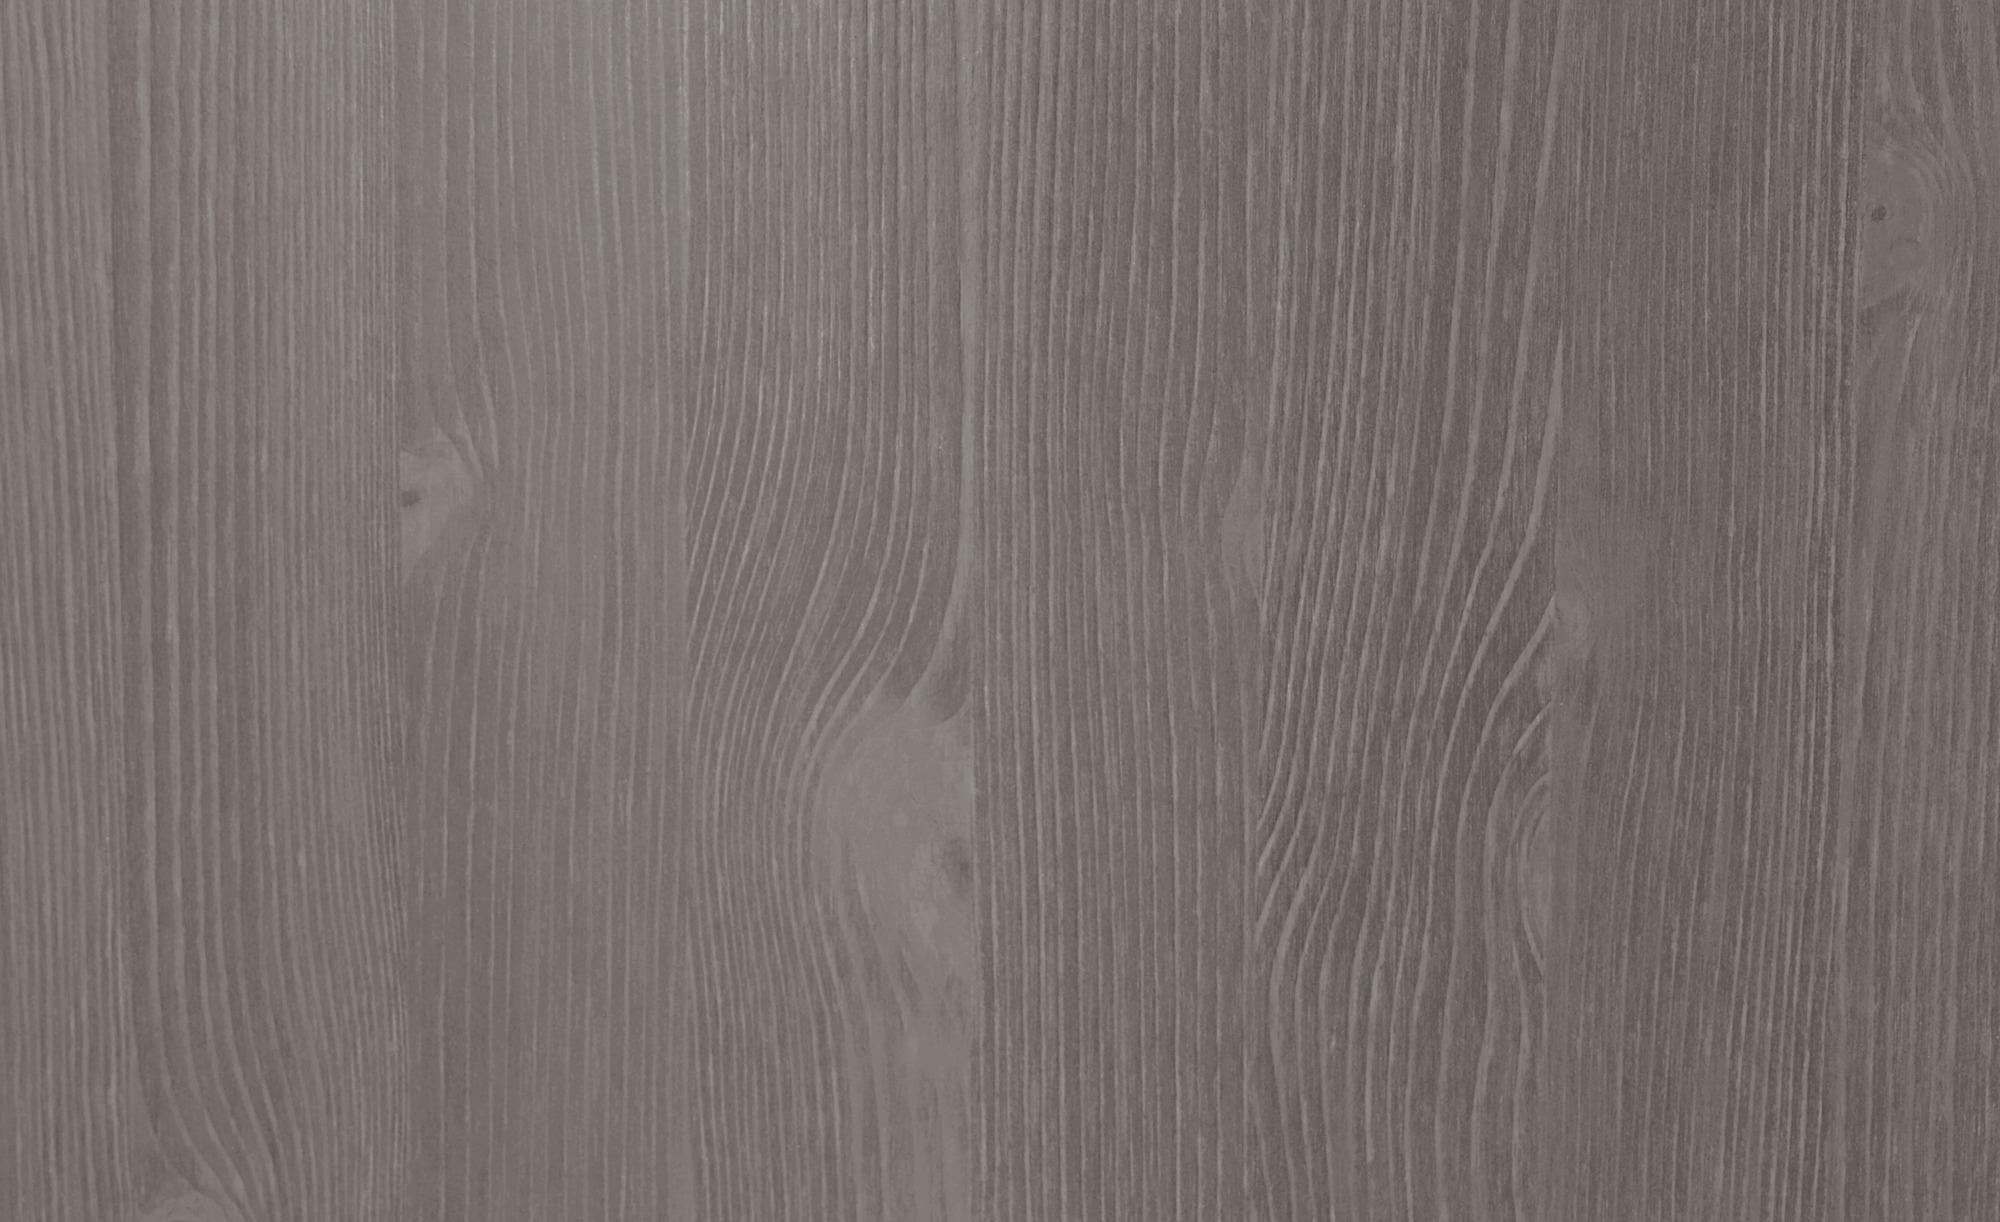 maison bleue Lowboard  Florian - grau - 118,5 cm - 53,4 cm - 48 cm - Kommoden & Sideboards > Lowboards - Möbel Kraft | Wohnzimmer > Schränke > Lowboards | maison bleue